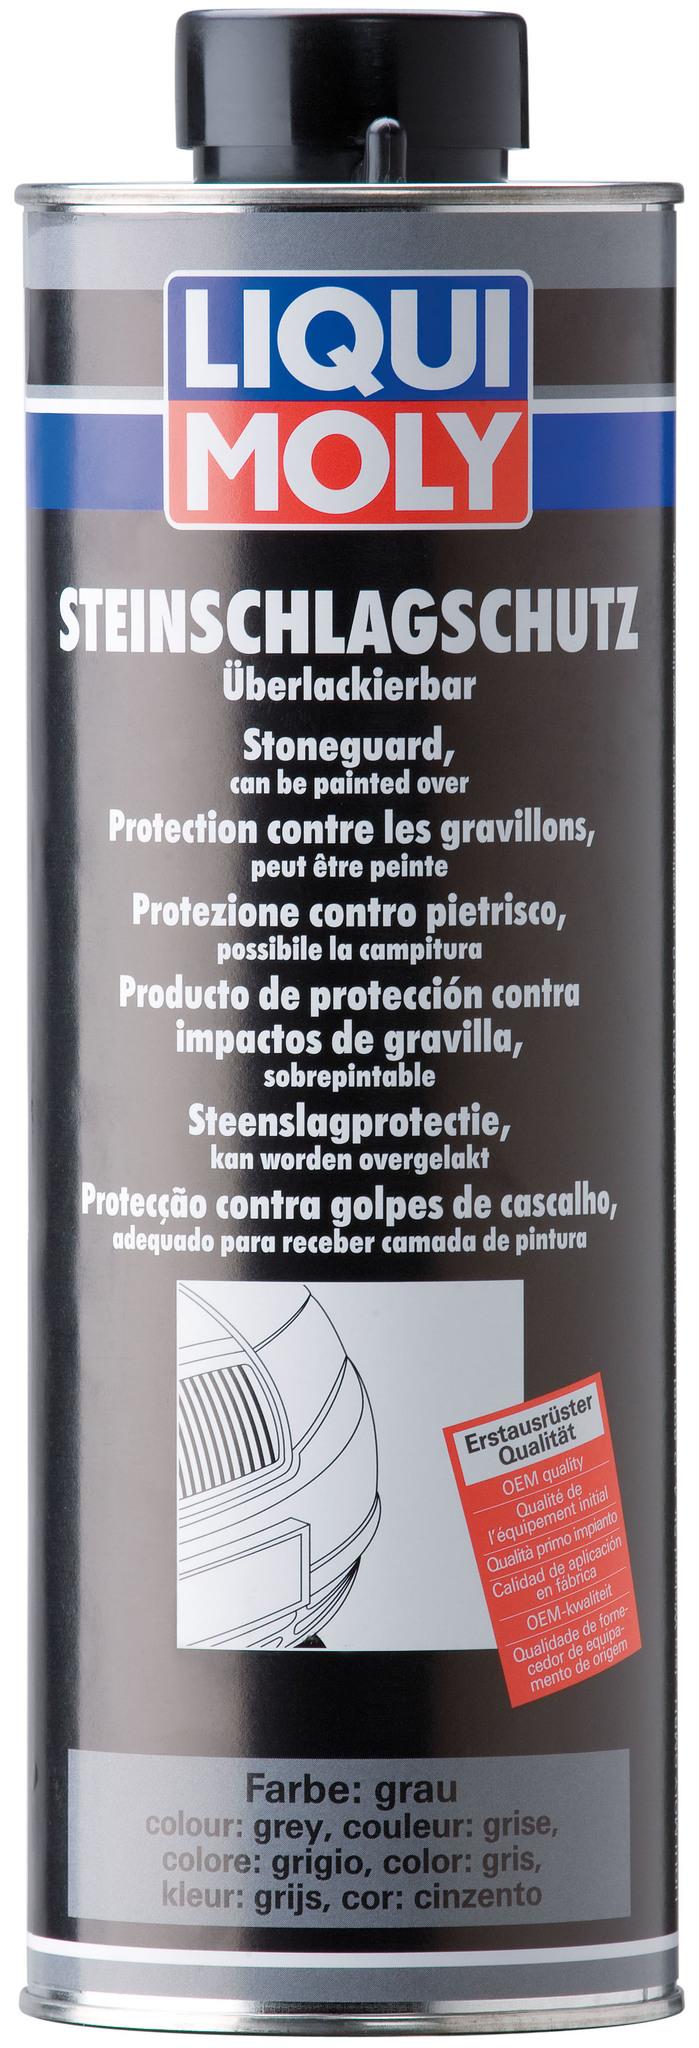 Liqui Moly Steinschlag-Schutz grau  Антигравий (серый)